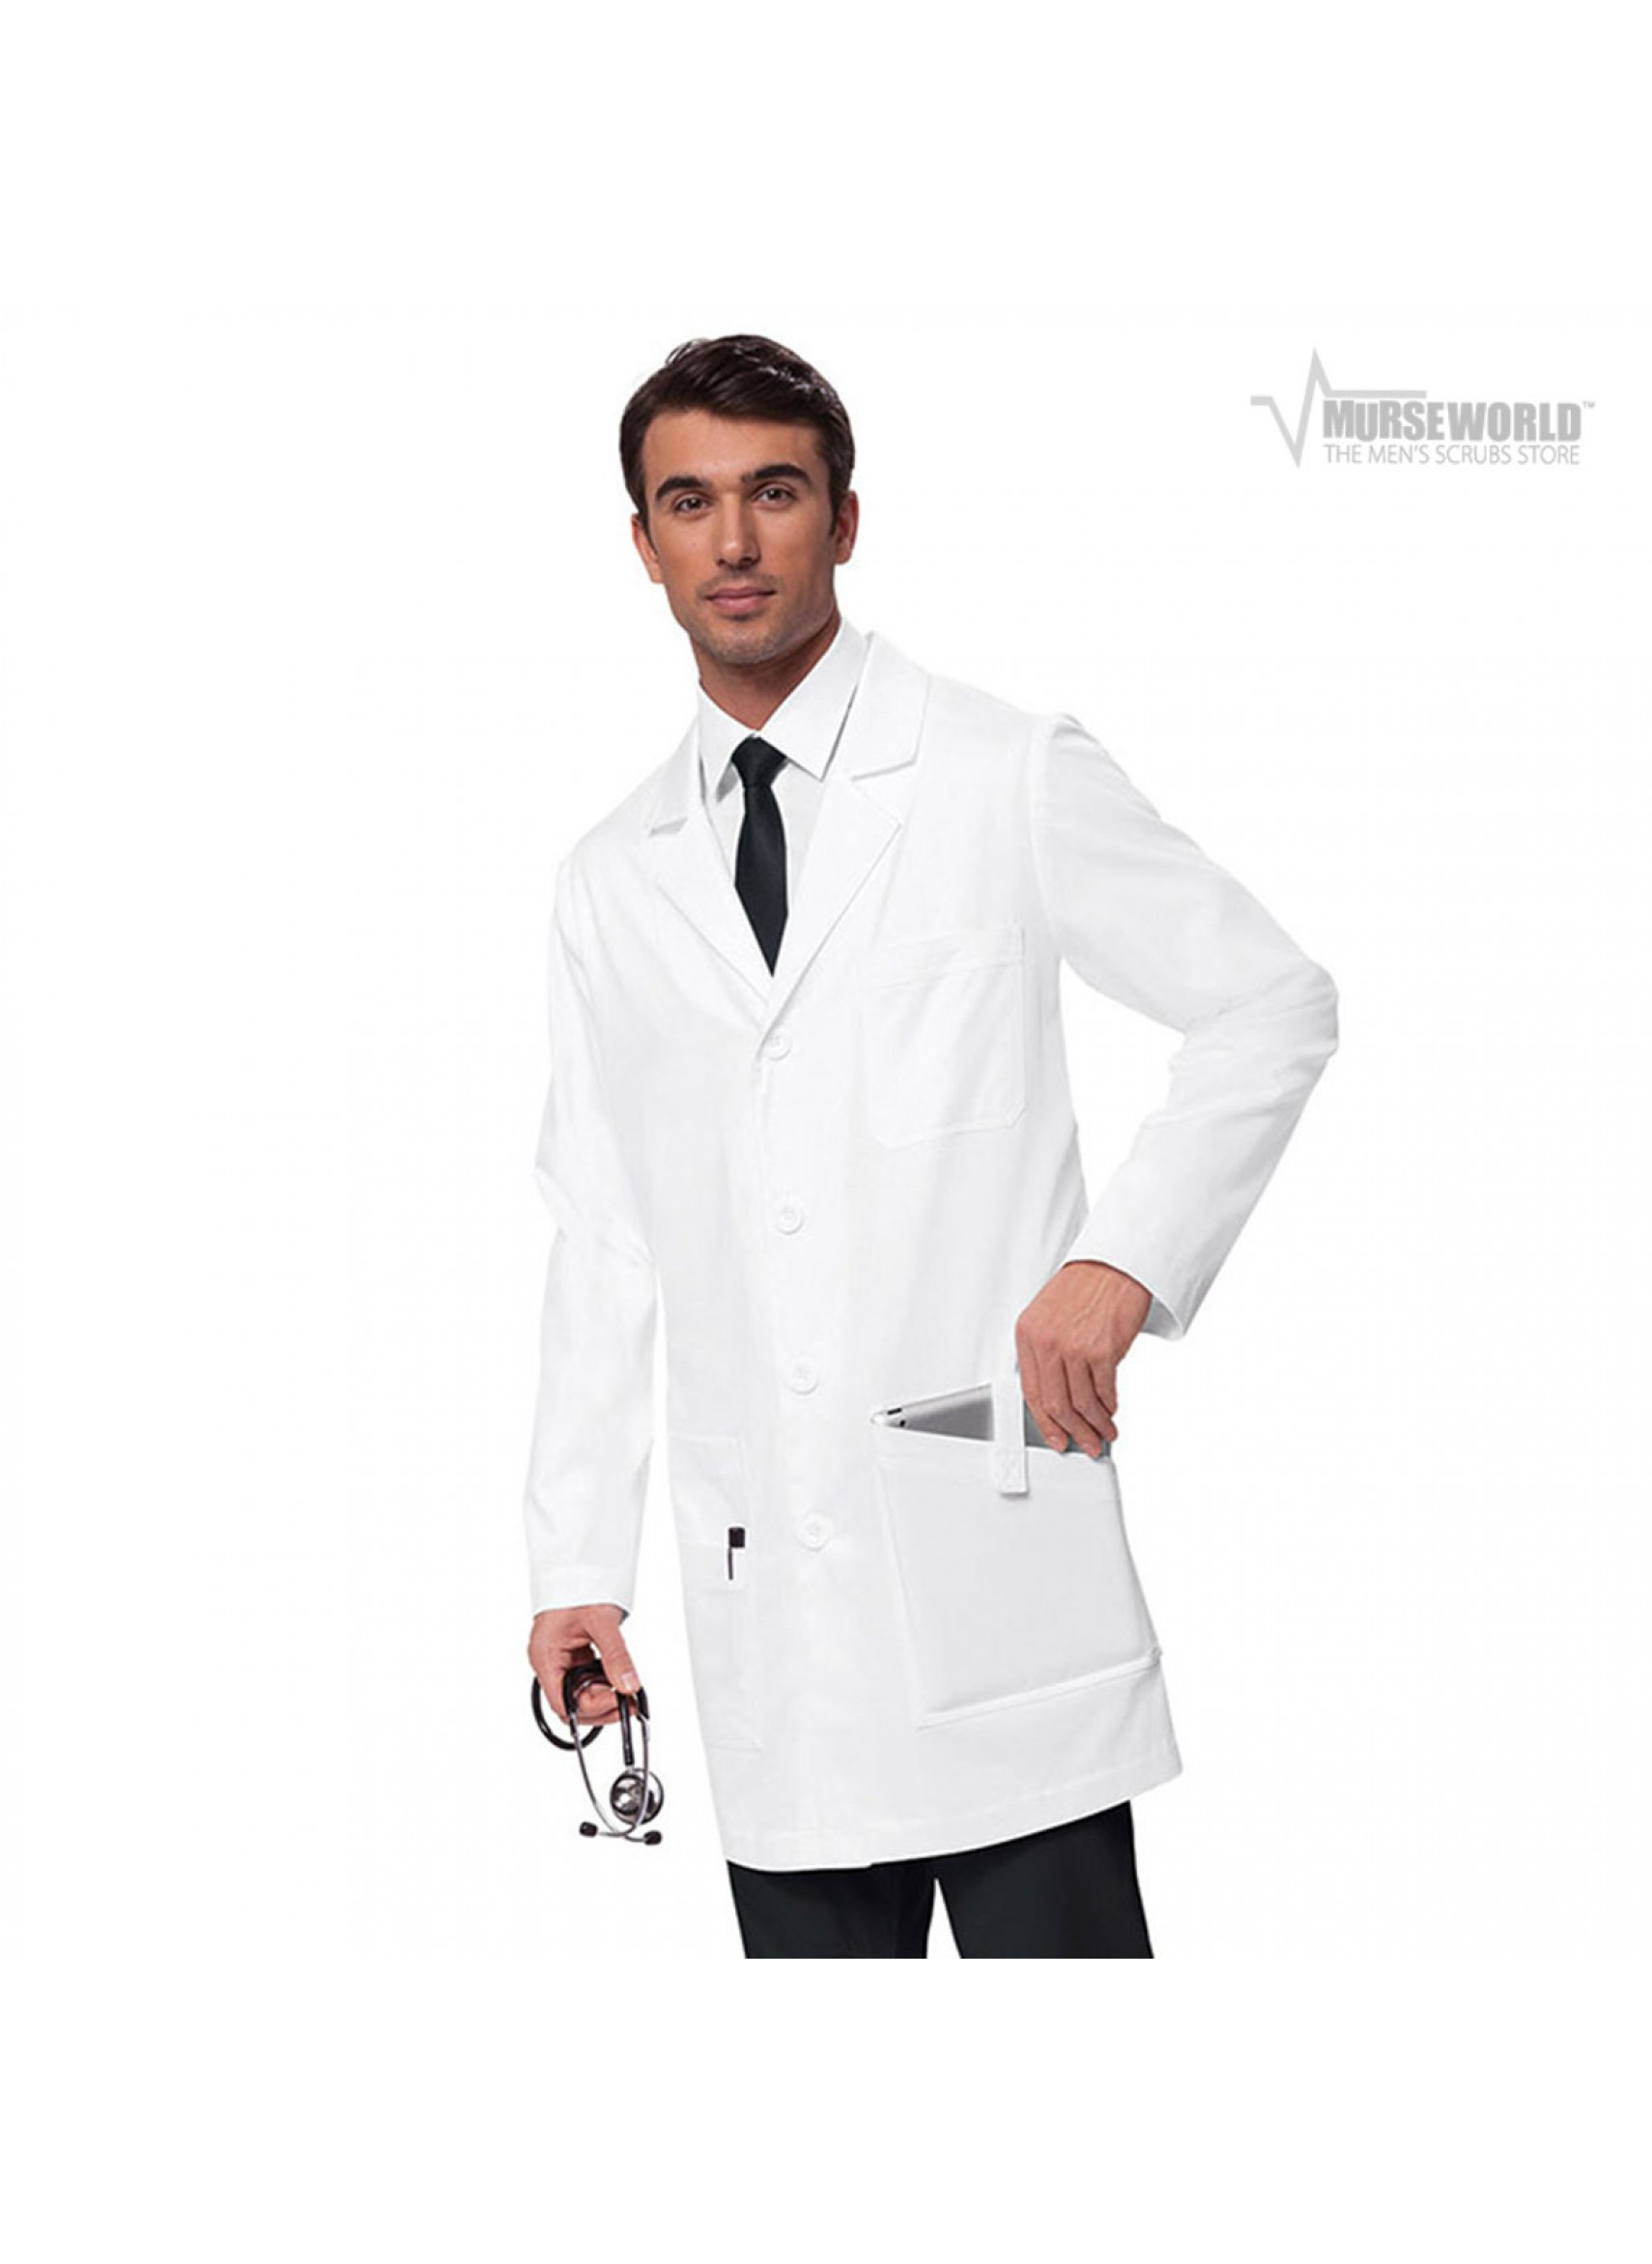 Koi Men's Lab Coat - Jack | Murse World